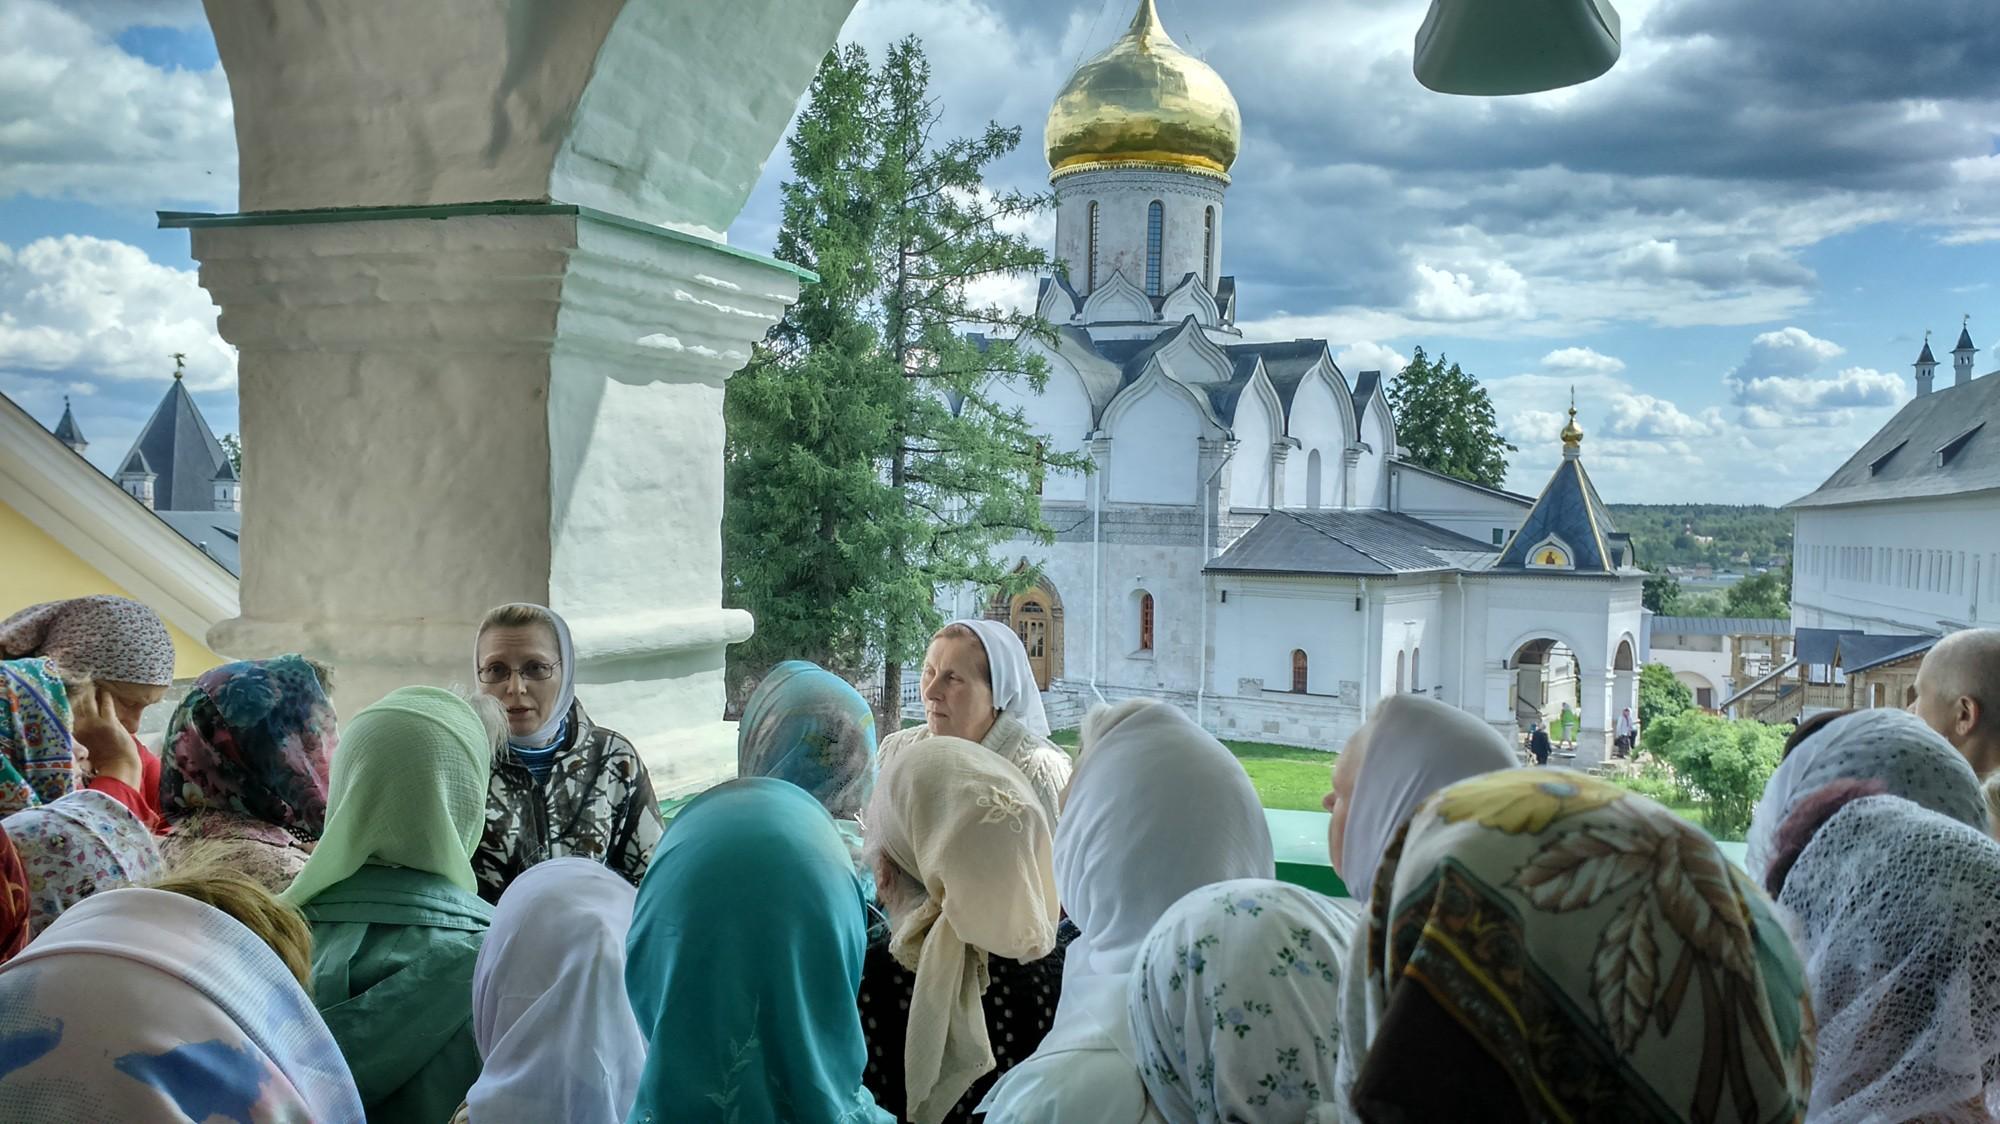 http://bogorodsk-blago.ru/media/photos/926268f825556d9e0ec5a6eca81a04d9.jpg